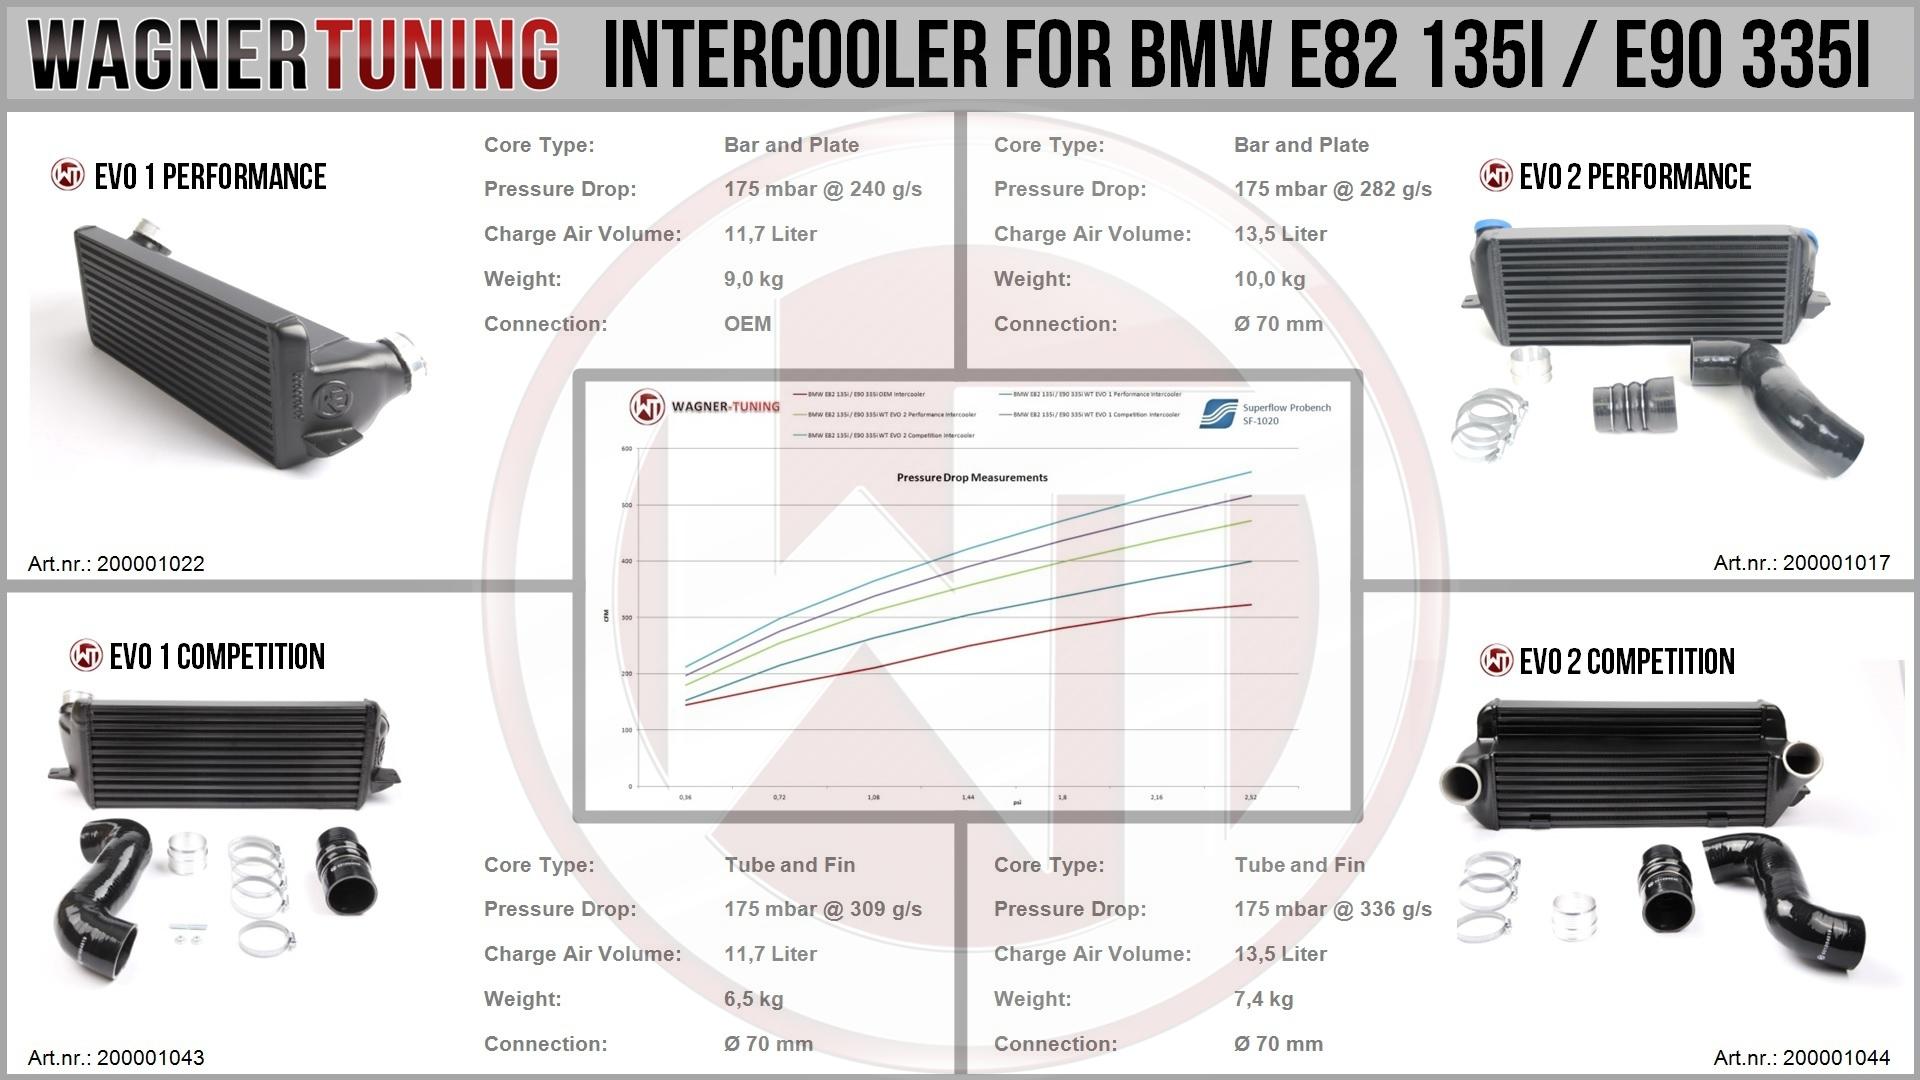 hight resolution of bmw 335i intercooler engine diagram wiring diagram centre bmw 335i intercooler engine diagram